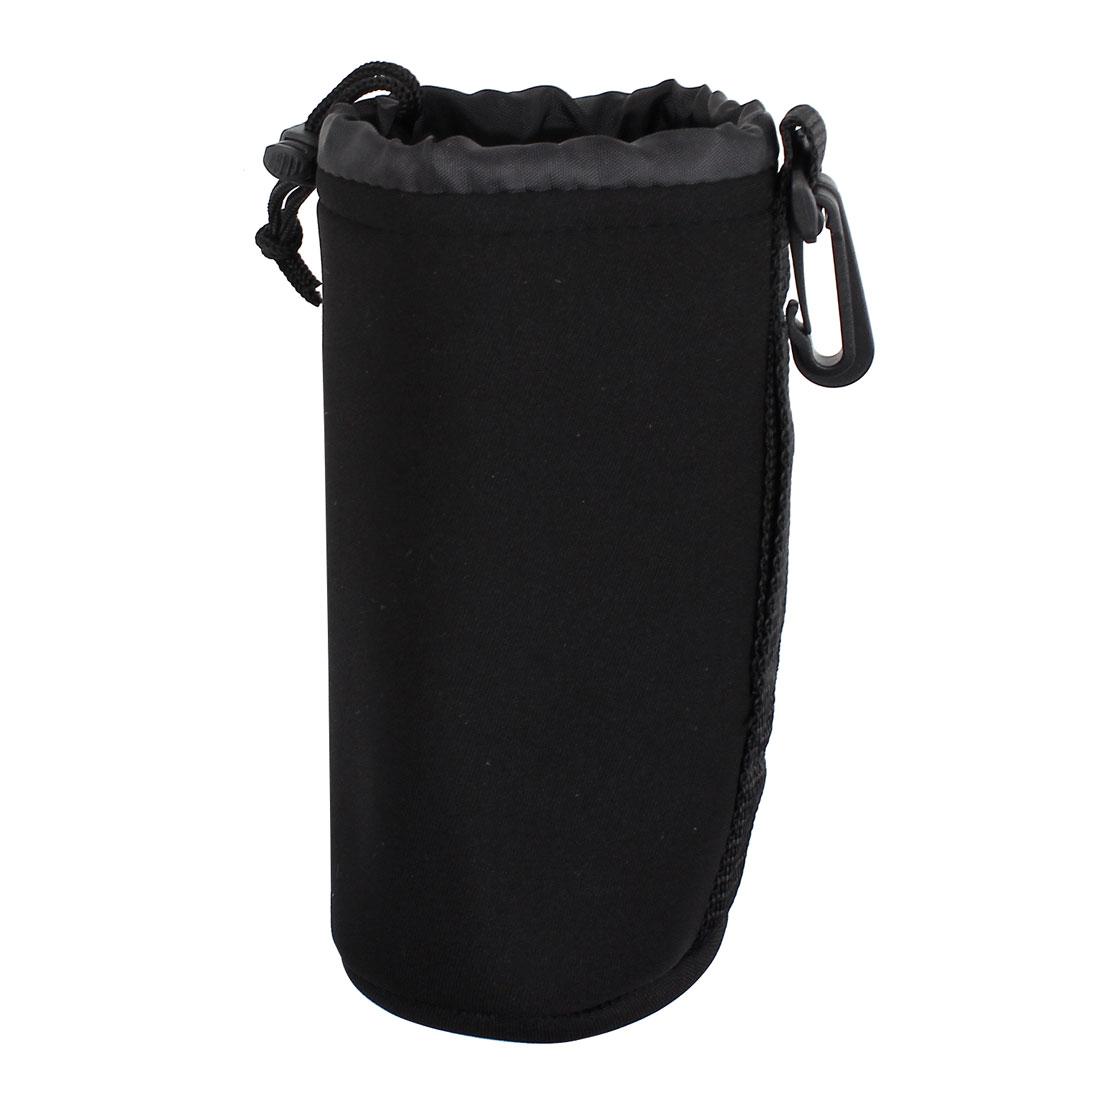 Size L Neoprene Lens Carrying Pouch Bag Holder Black for Digital Camera